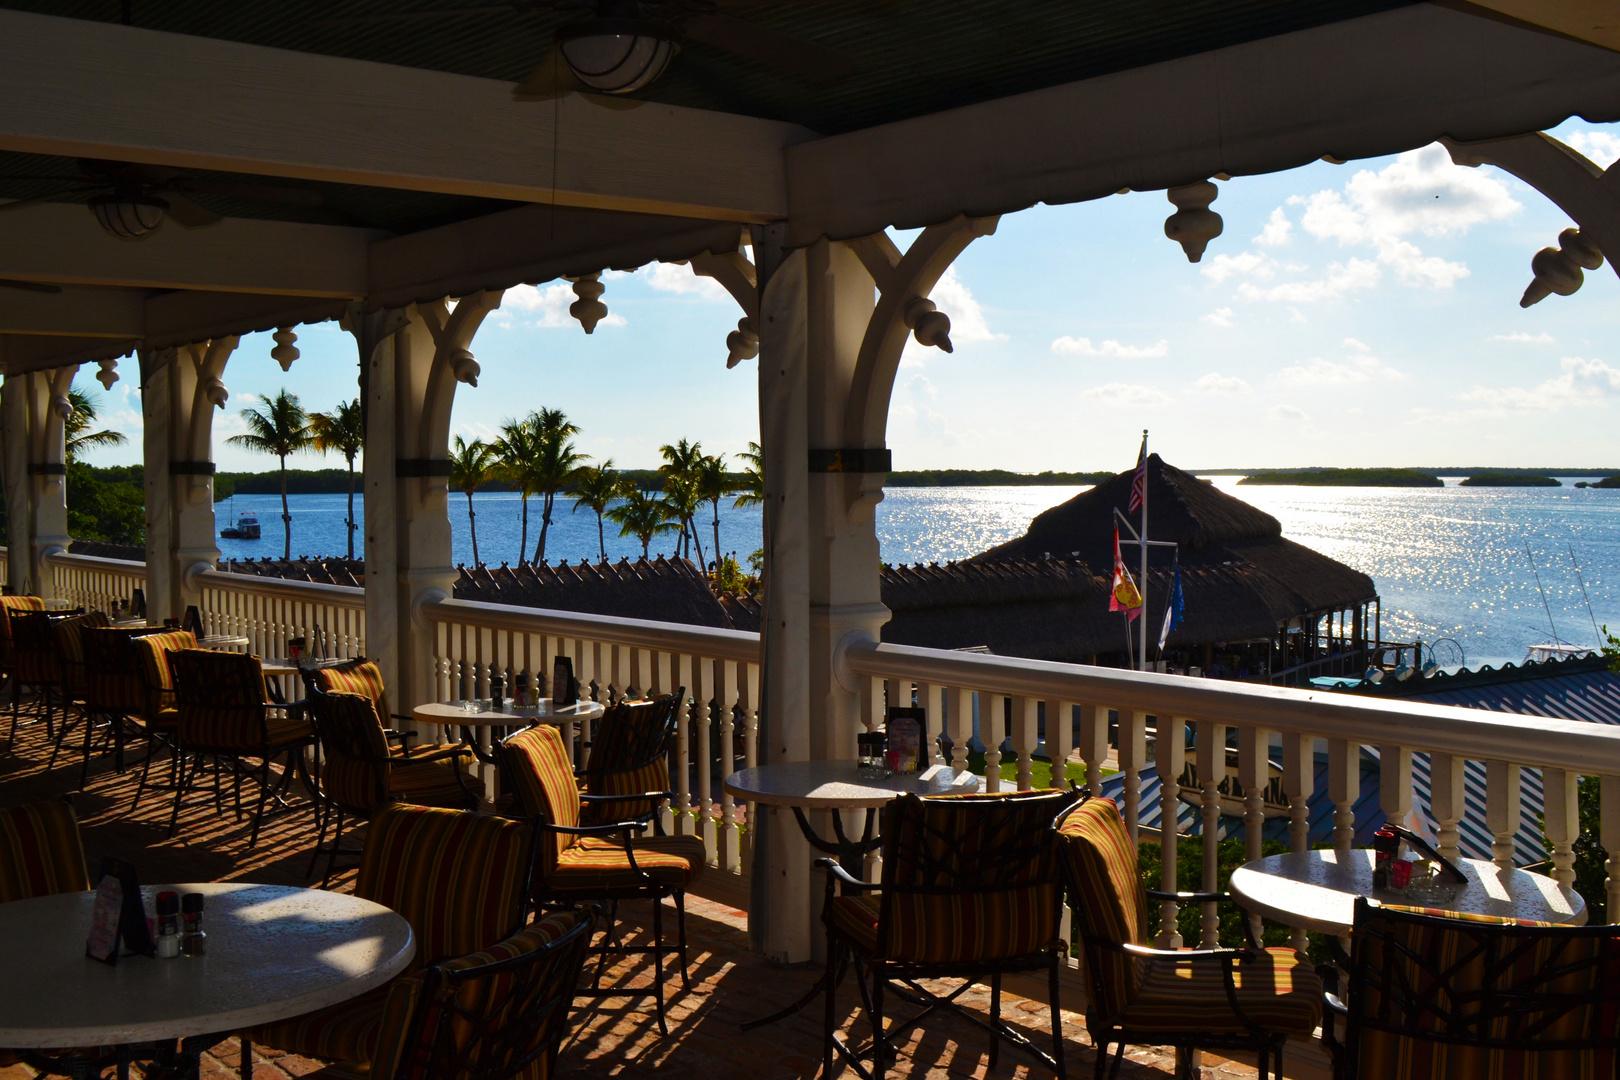 Key West Life